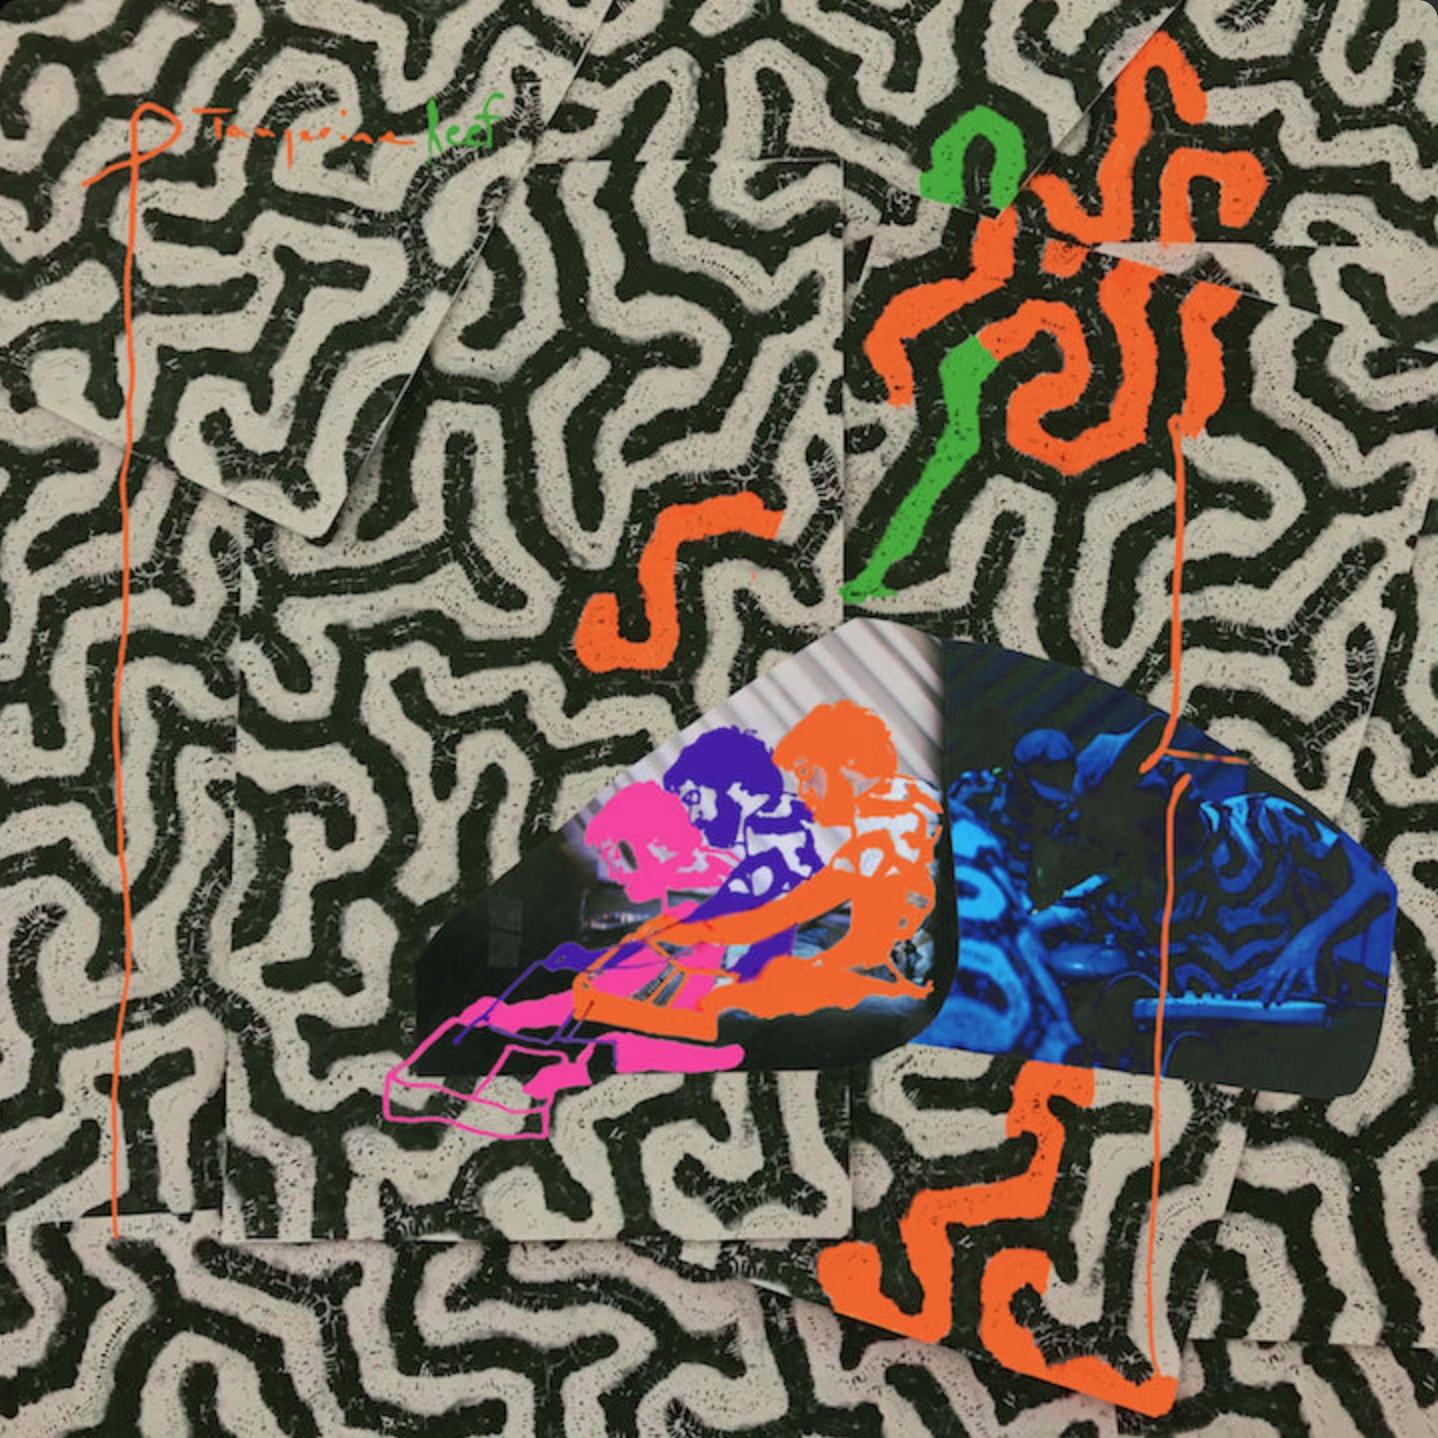 Animal Collective announce new audiovisual album Tangerine Reef